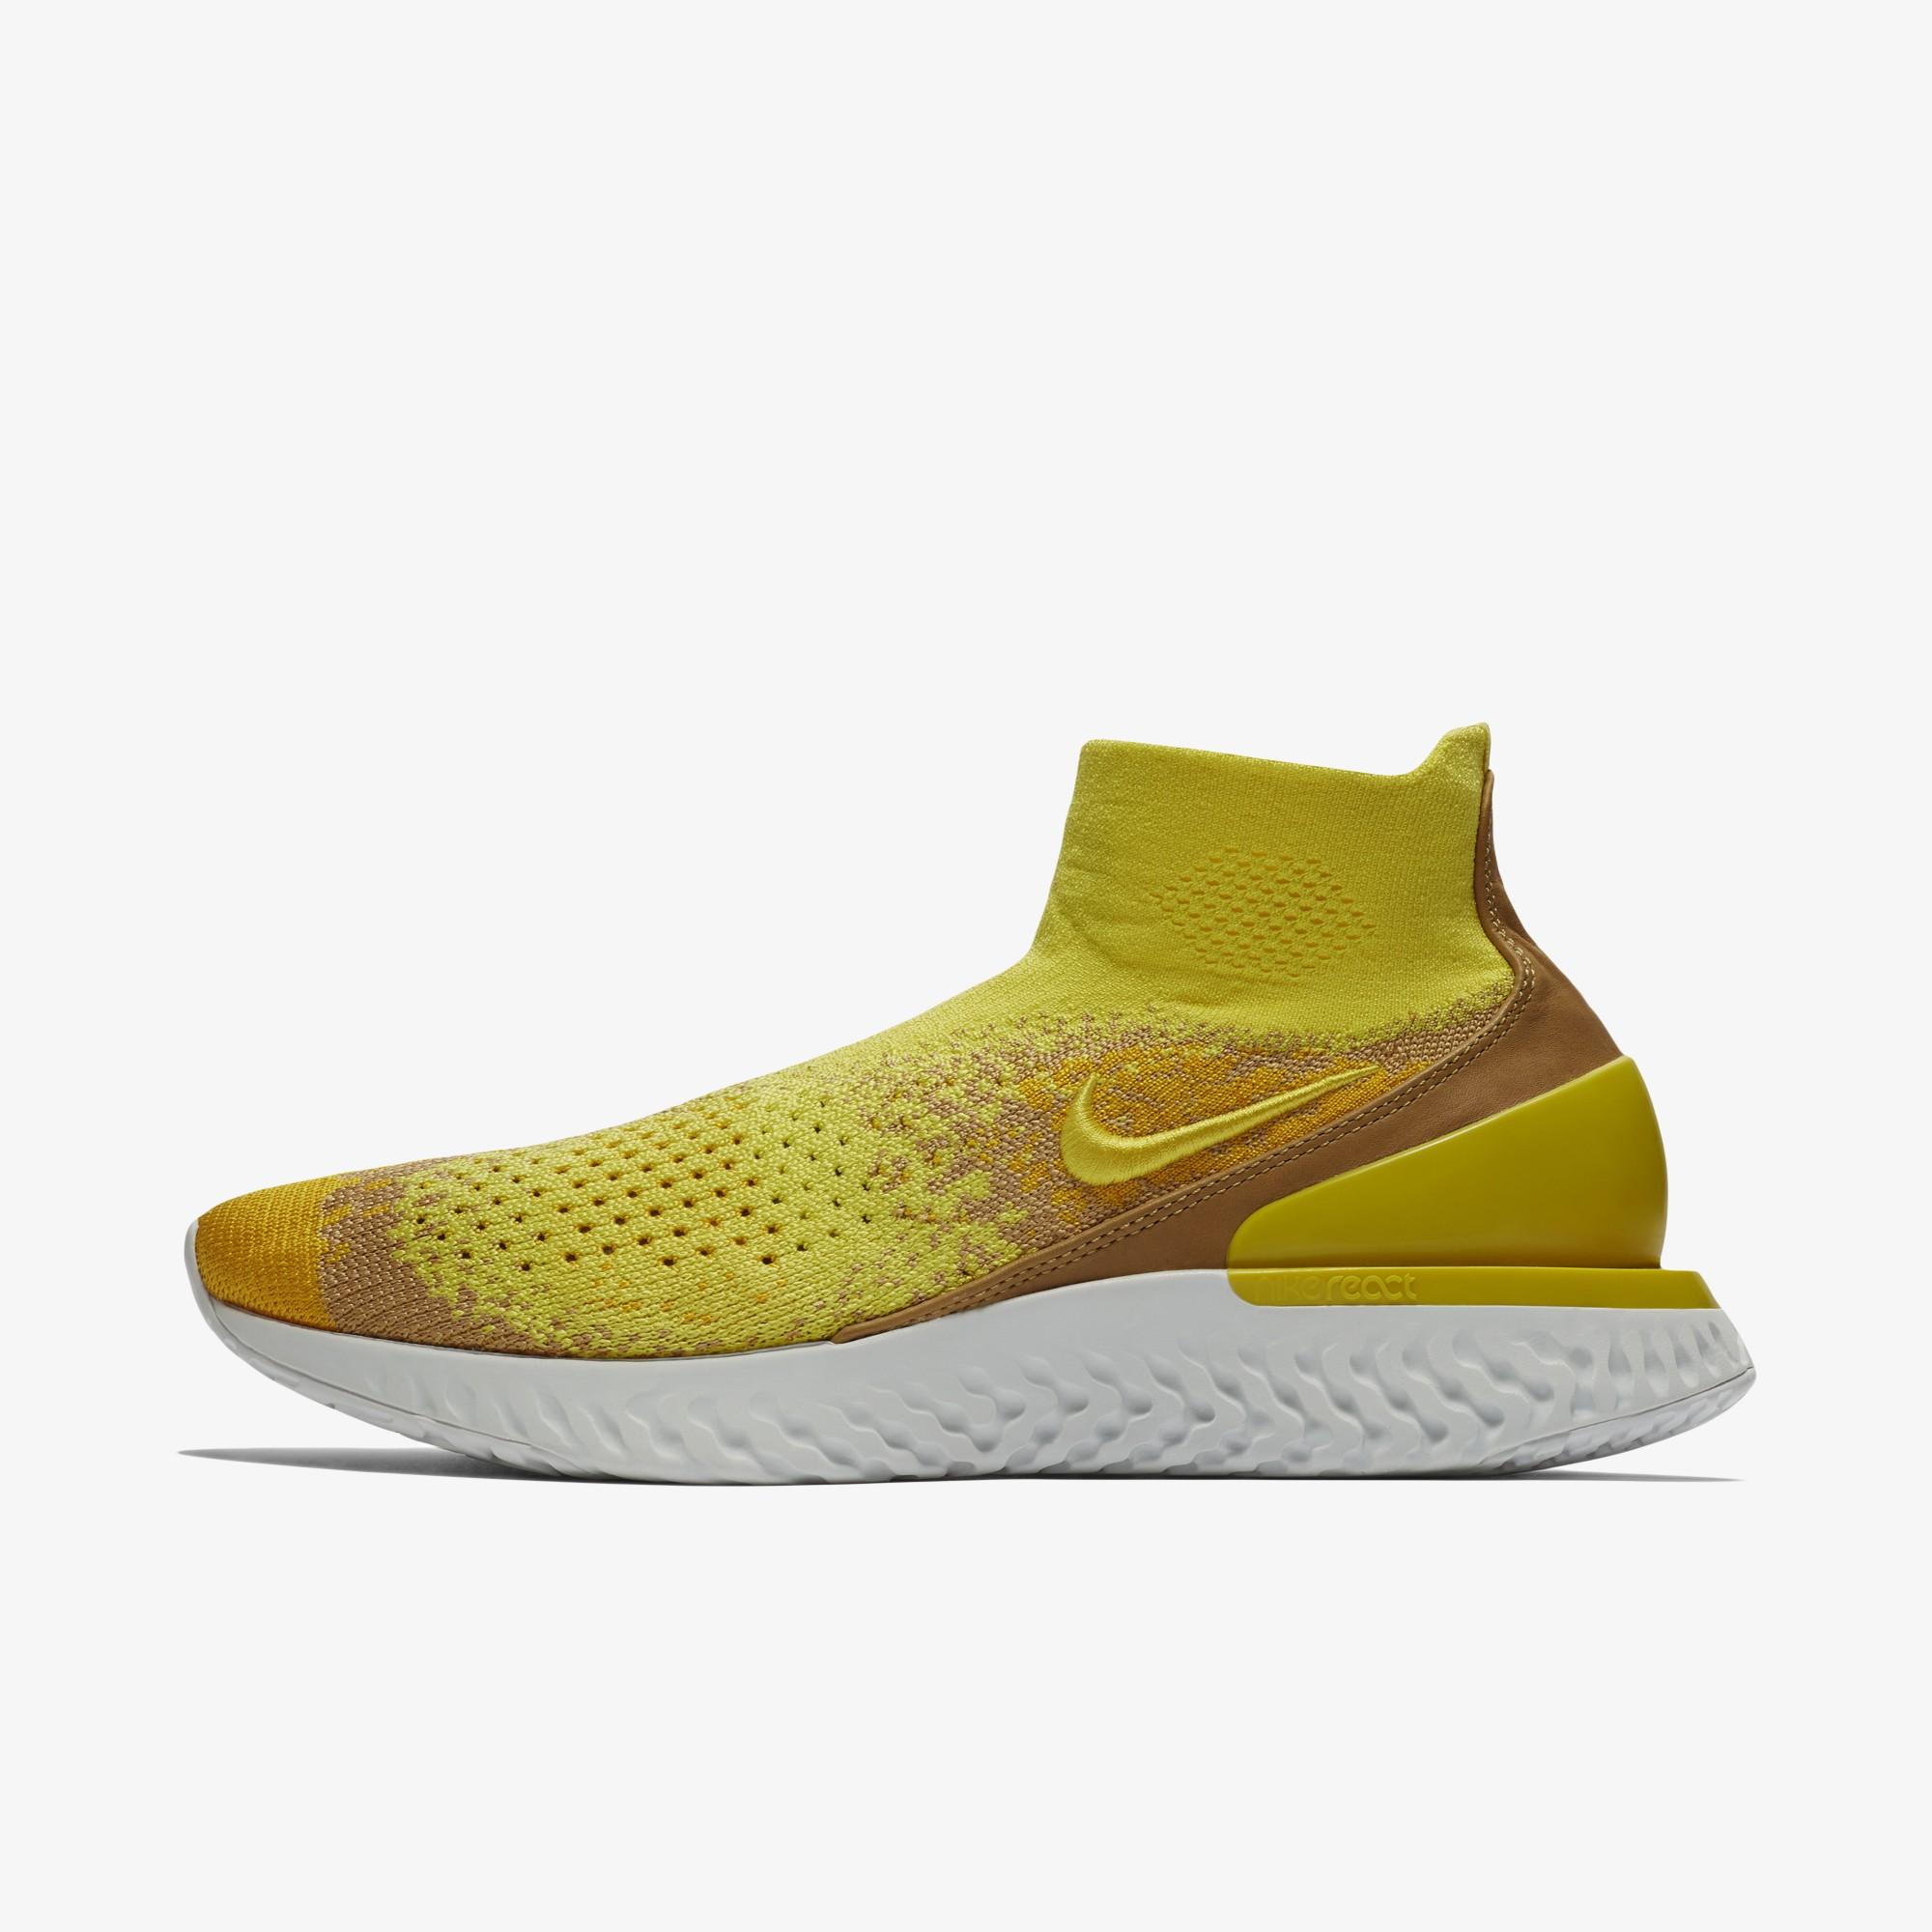 Nike Rise React Fly Knitwear Limited.jpg